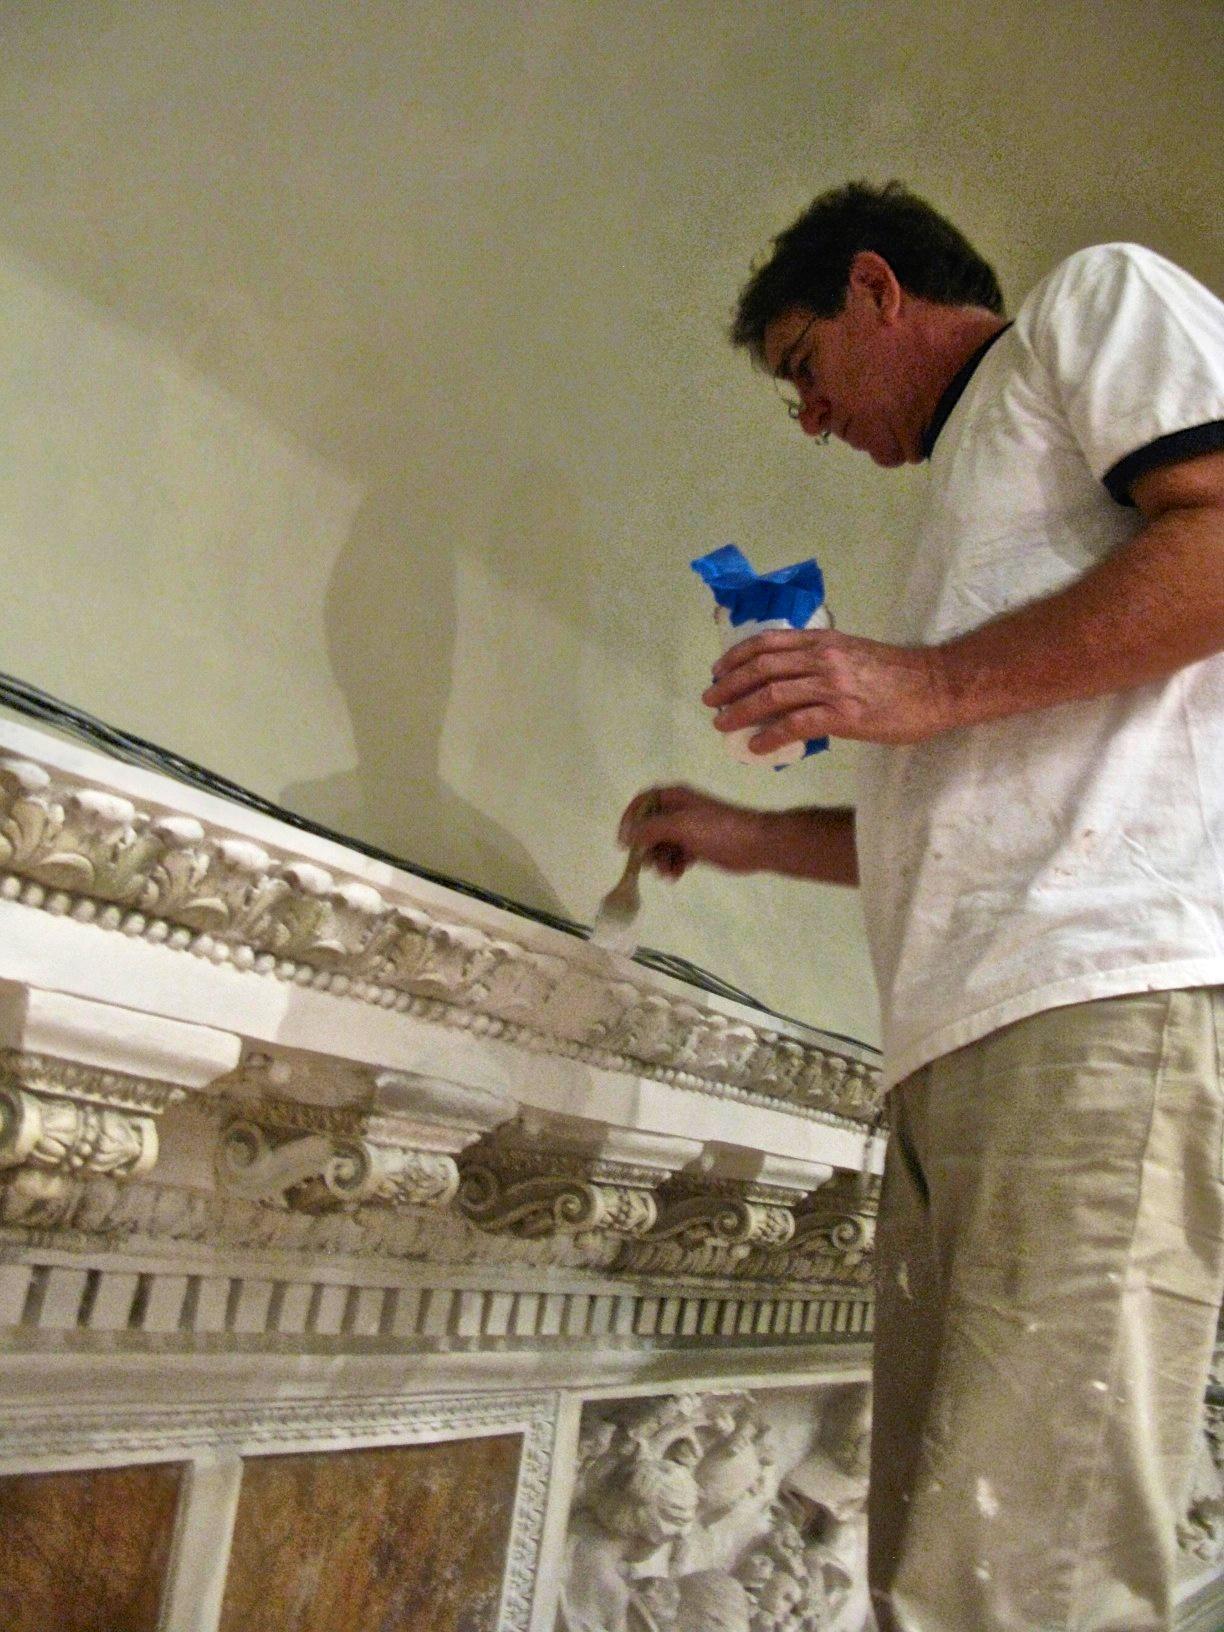 Jonathan Pettus restoring plaster work at The John and Mable Ringling Museum of Art.